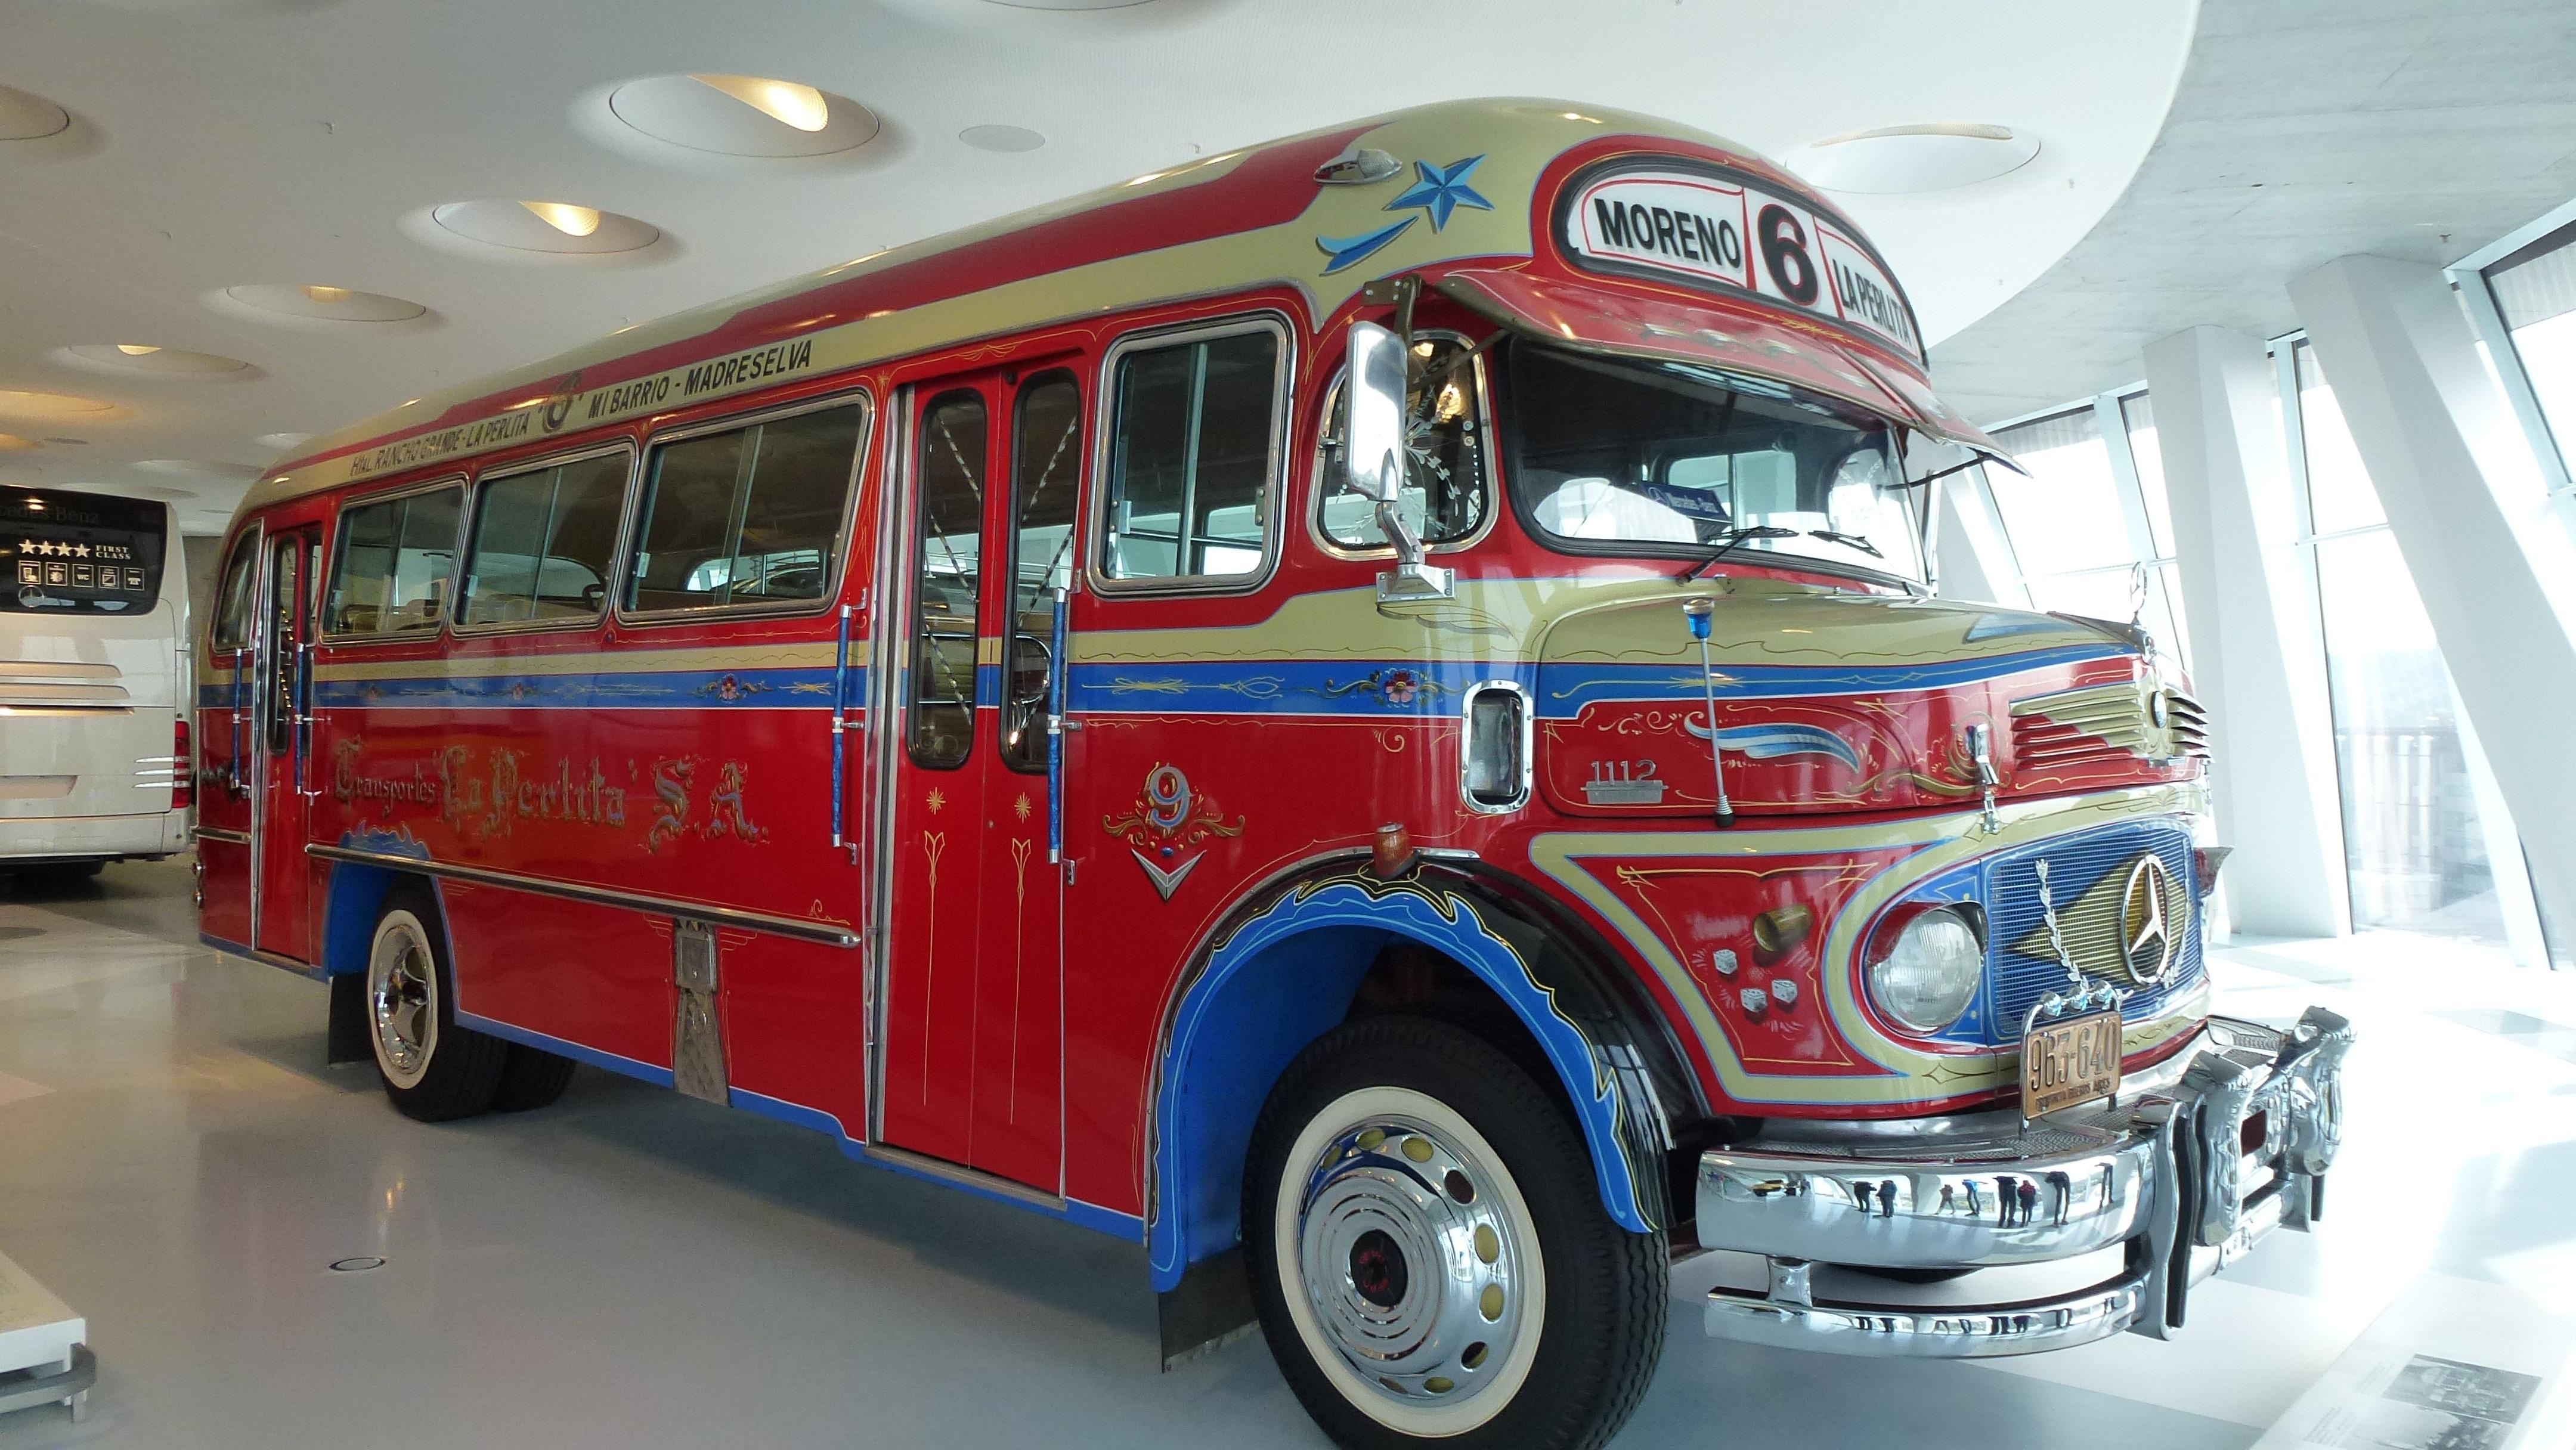 Free Images : red, museum, old car, public transport, oldtimer ...